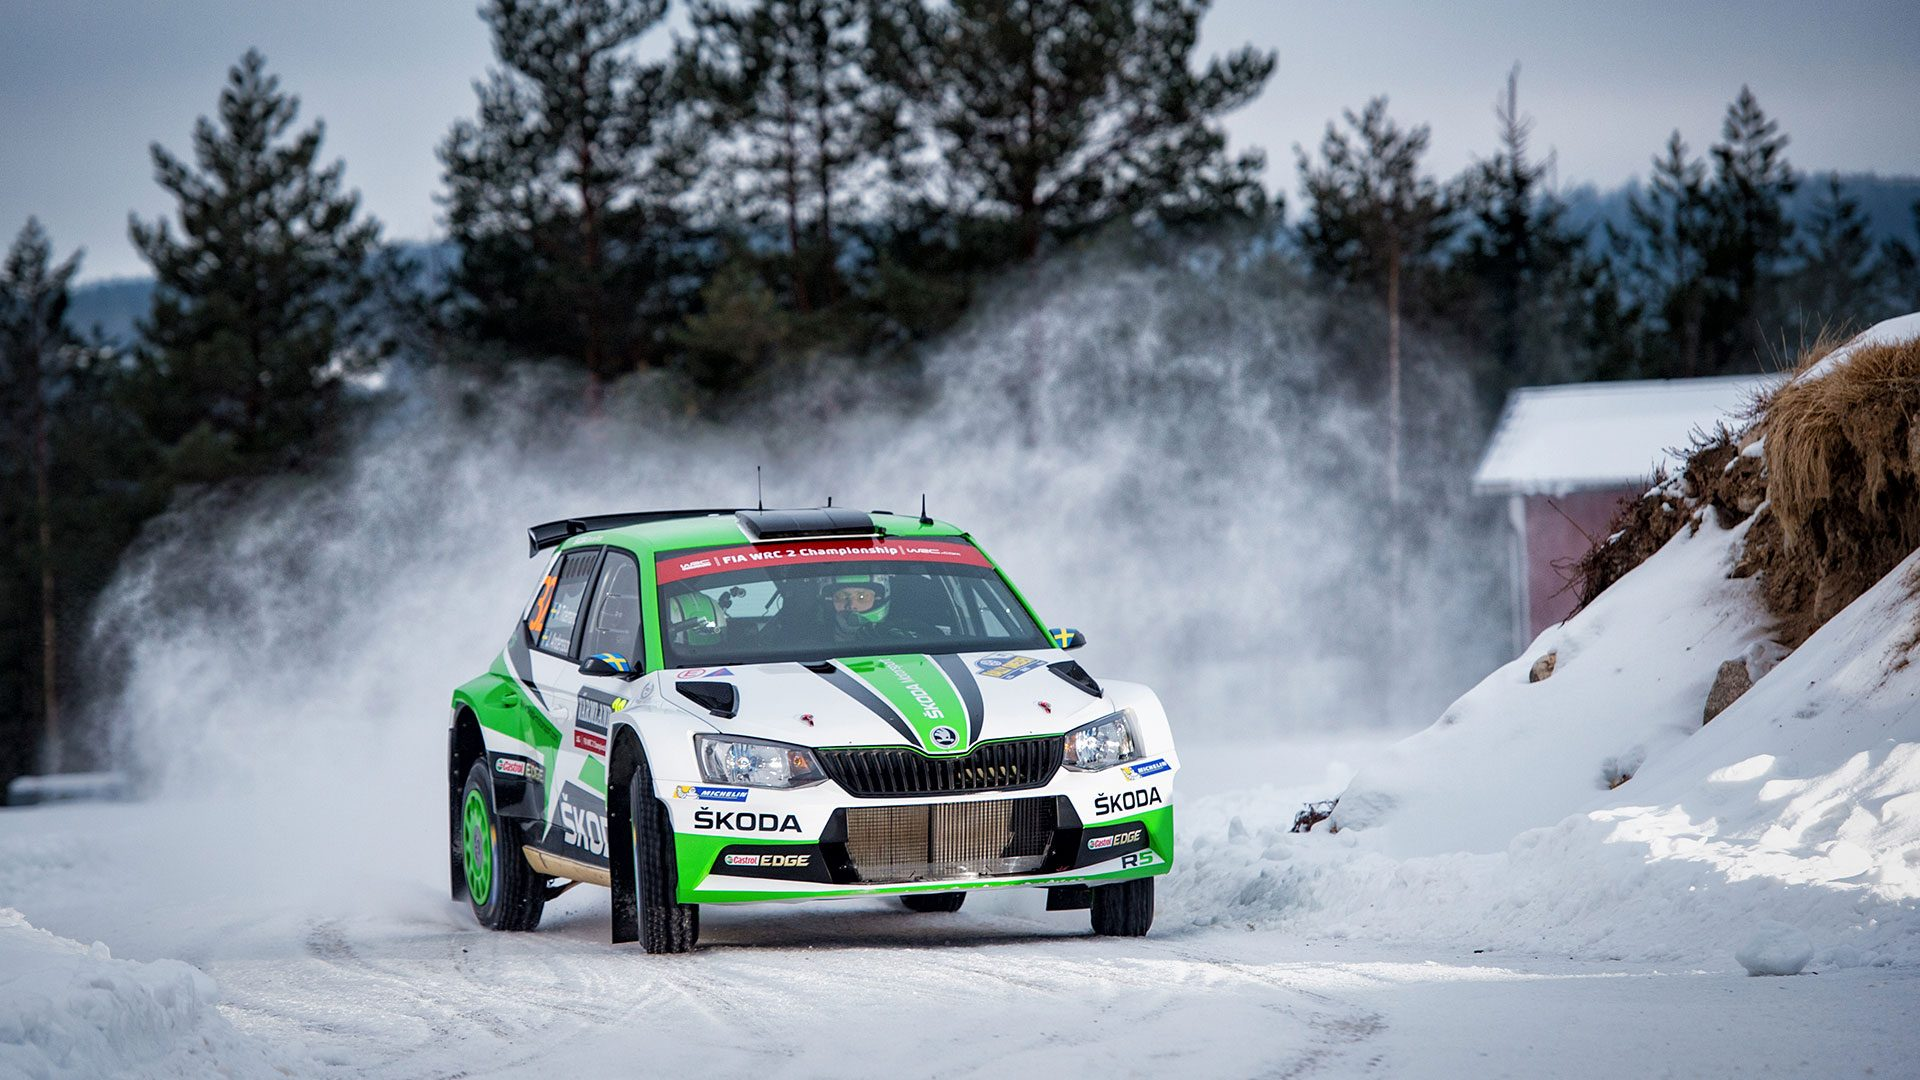 Wrc Sweden Tidemand Takes Acclaimed Home Win In The Skoda Fabia R5 Skoda Motorsport